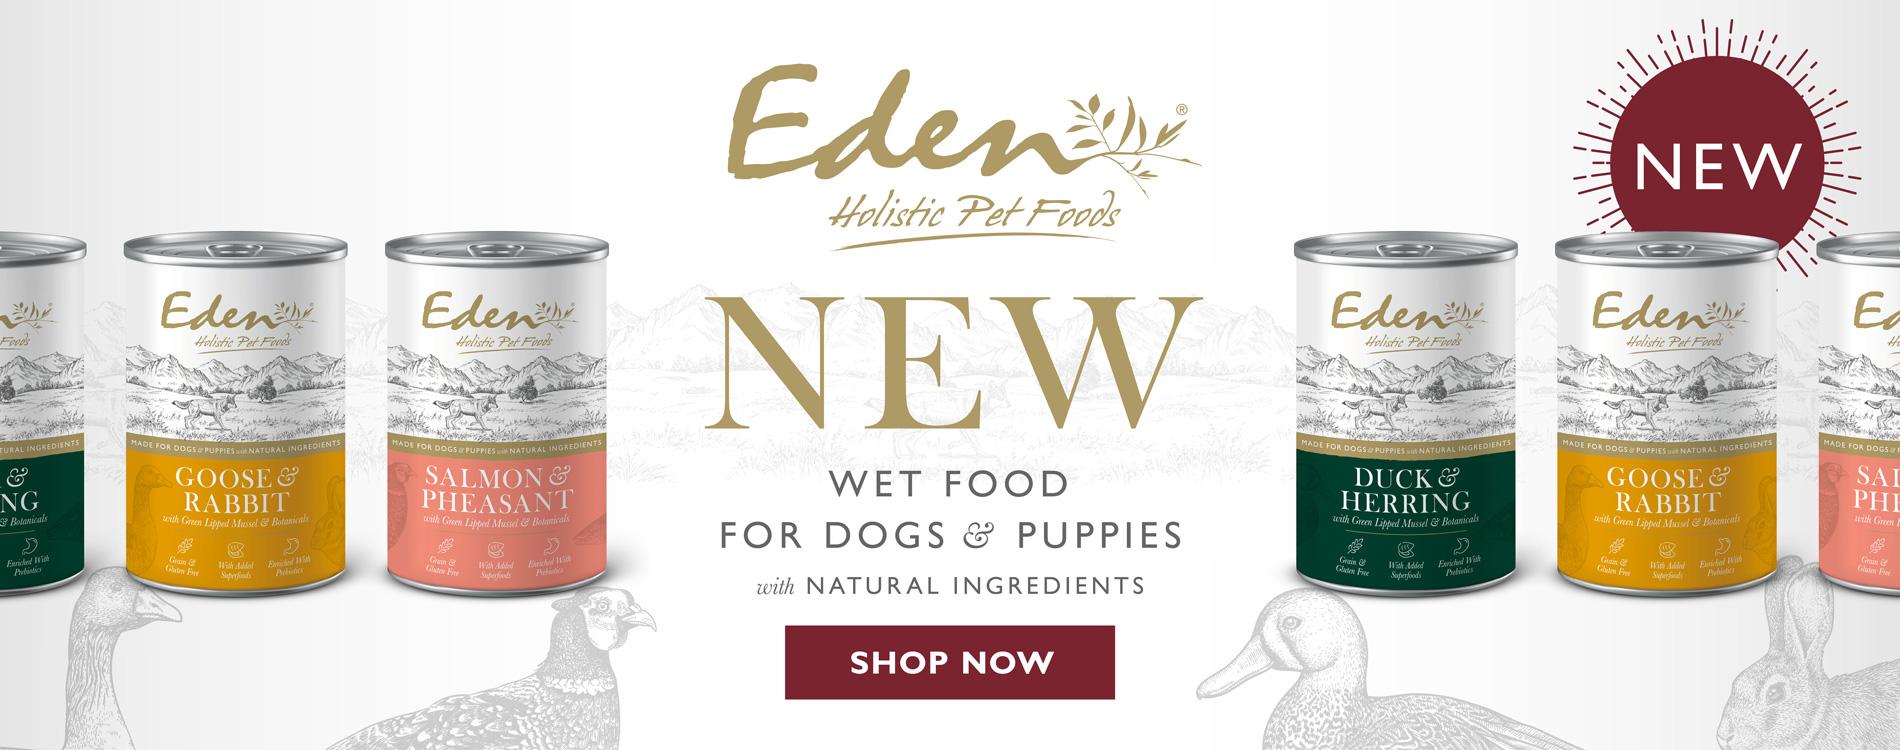 Eden Wet Dog Food